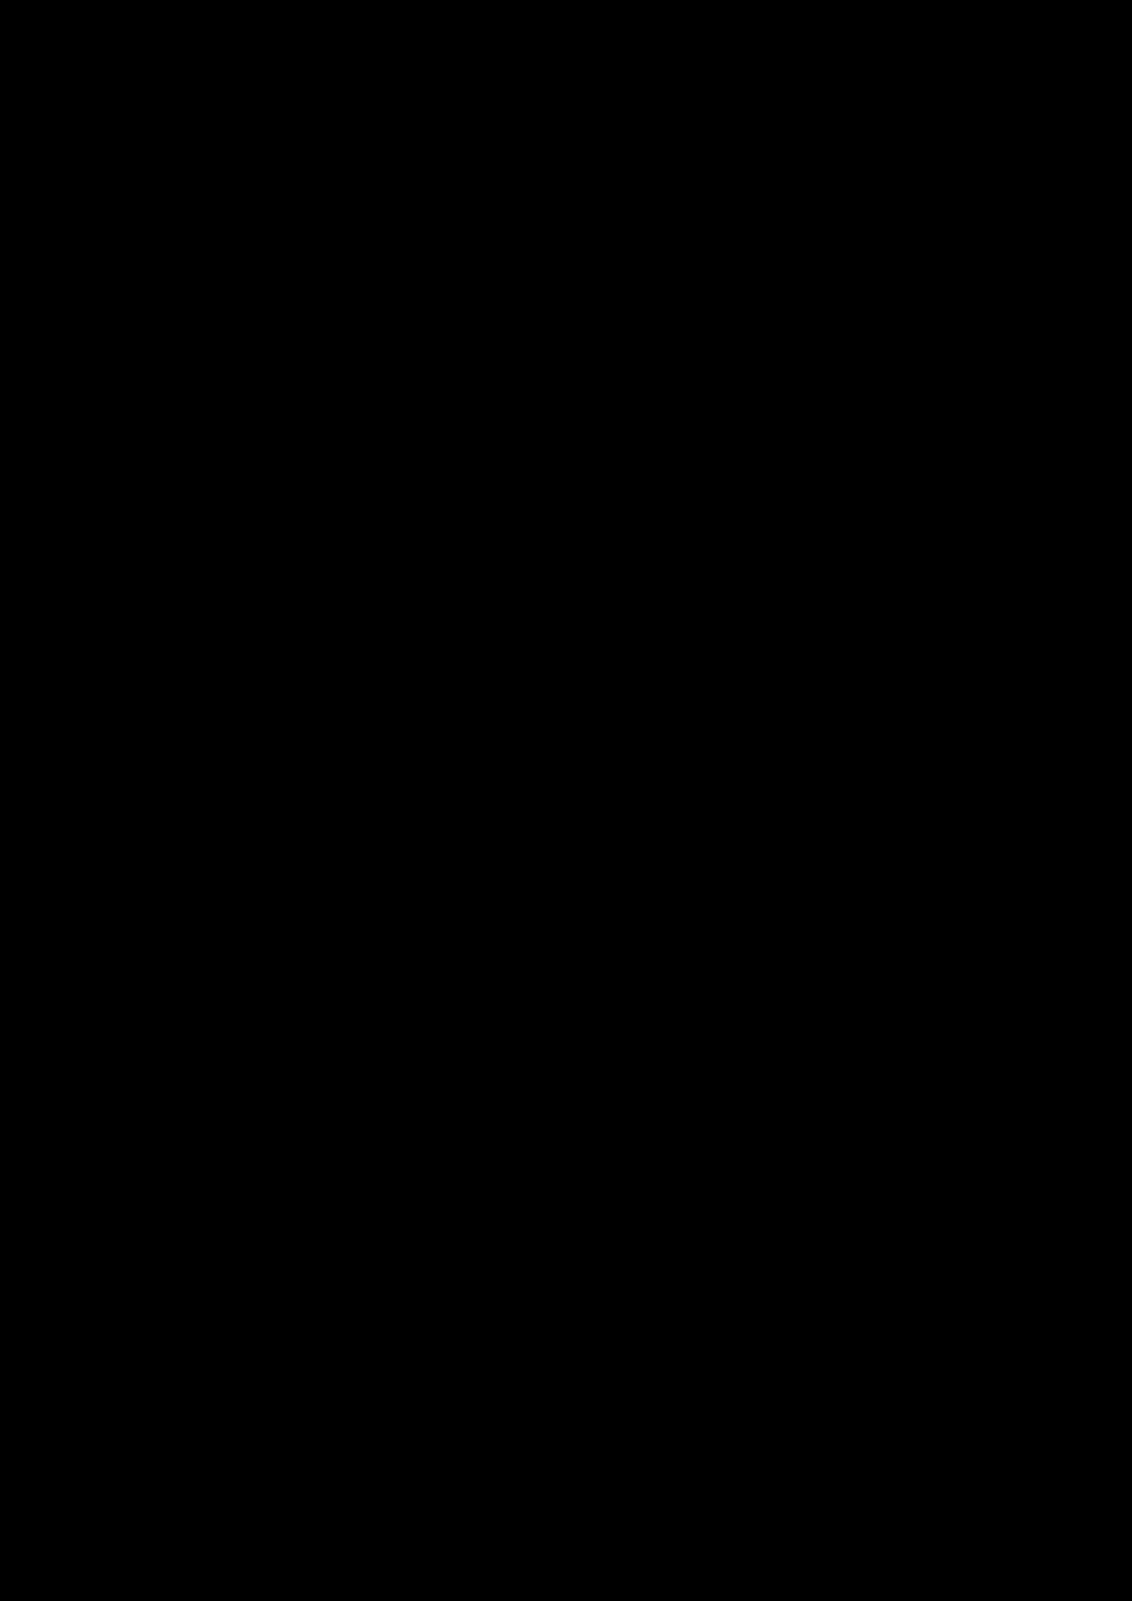 Ispoved Pervogo Boga slide, Image 64